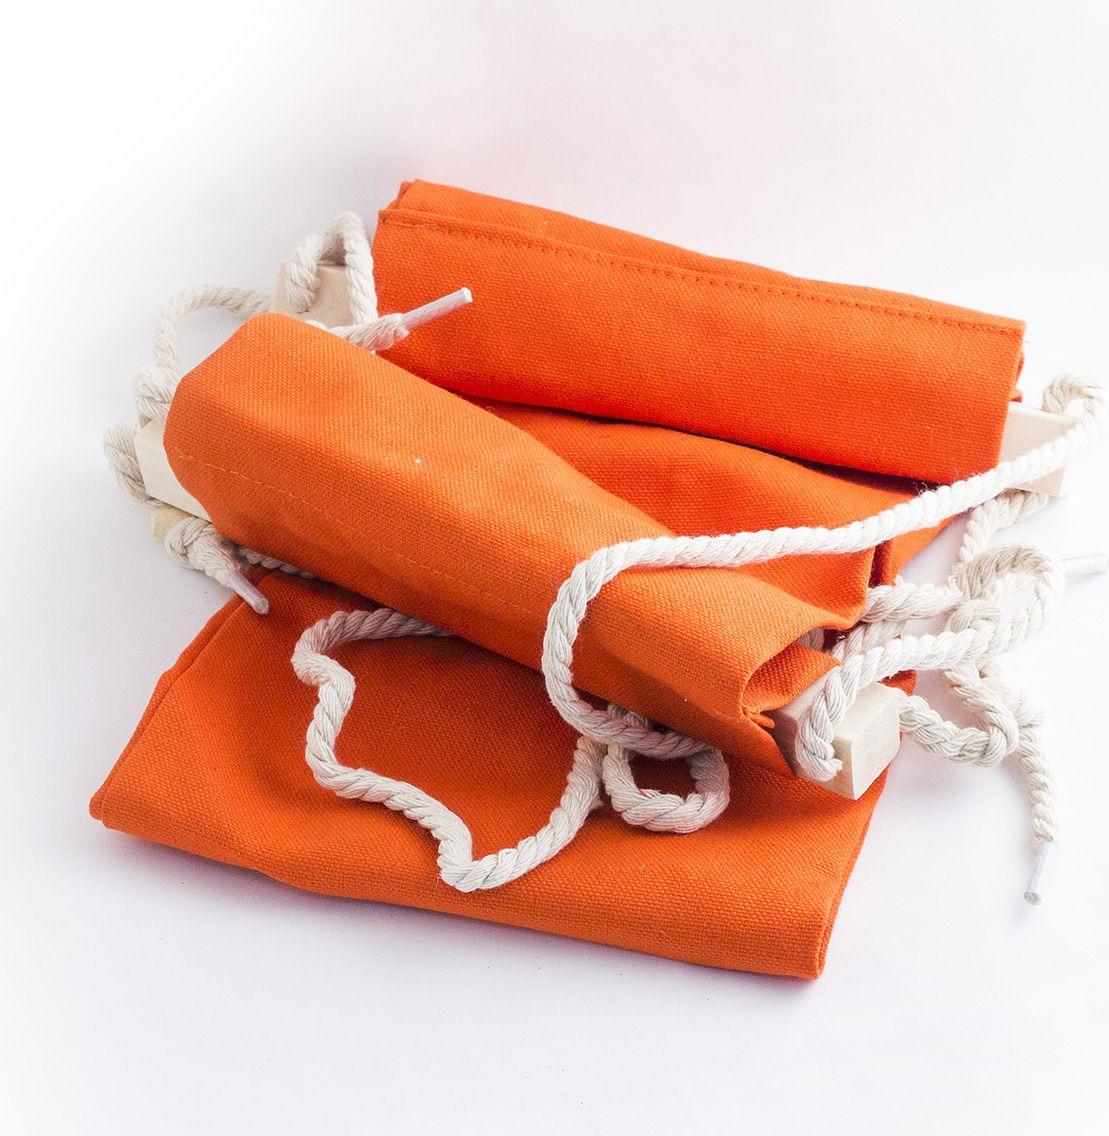 Гамак для ног Эврика, цвет: оранжевый, 62 х 17 х 2 см гамак для ног эврика цвет оранжевый 62 х 17 х 2 см